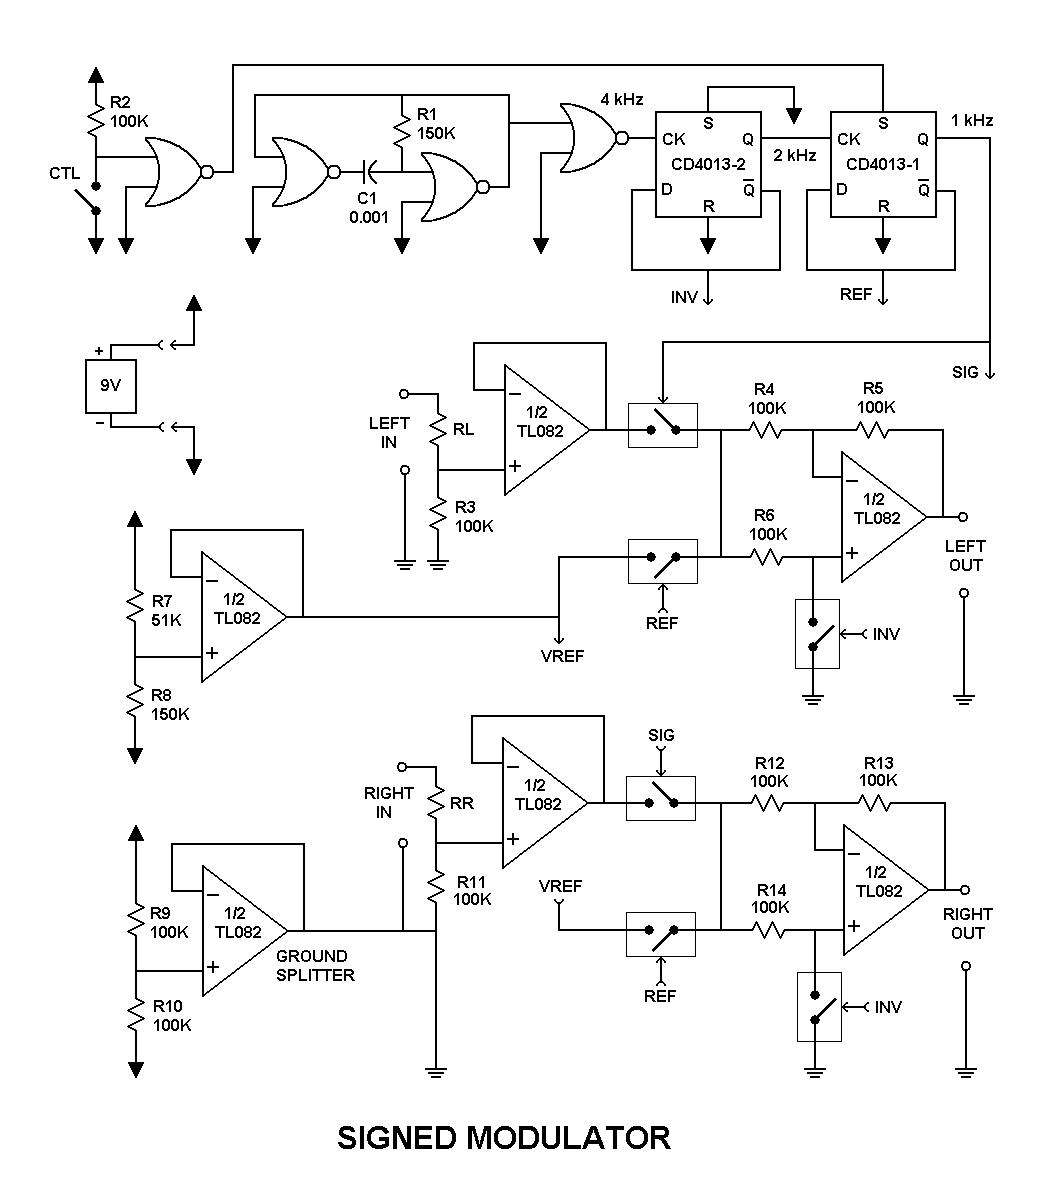 Daqarta - Sound Card External DC-to-AC Modulator [ 1200 x 1047 Pixel ]